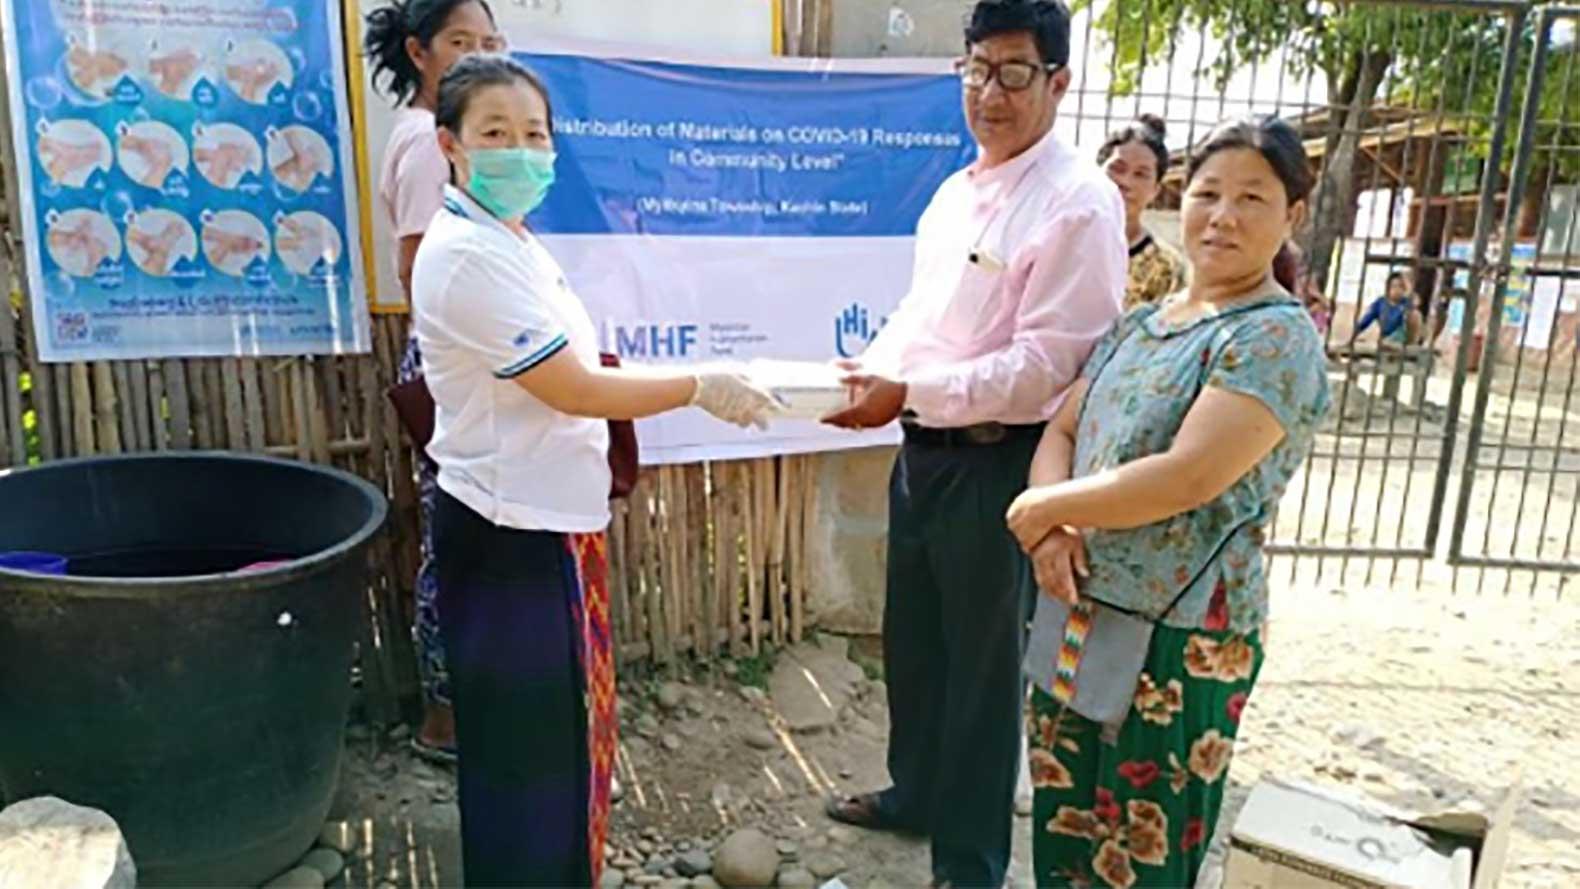 COVID-19 in Myanmar | Providing masks & virtual rehabilitation care